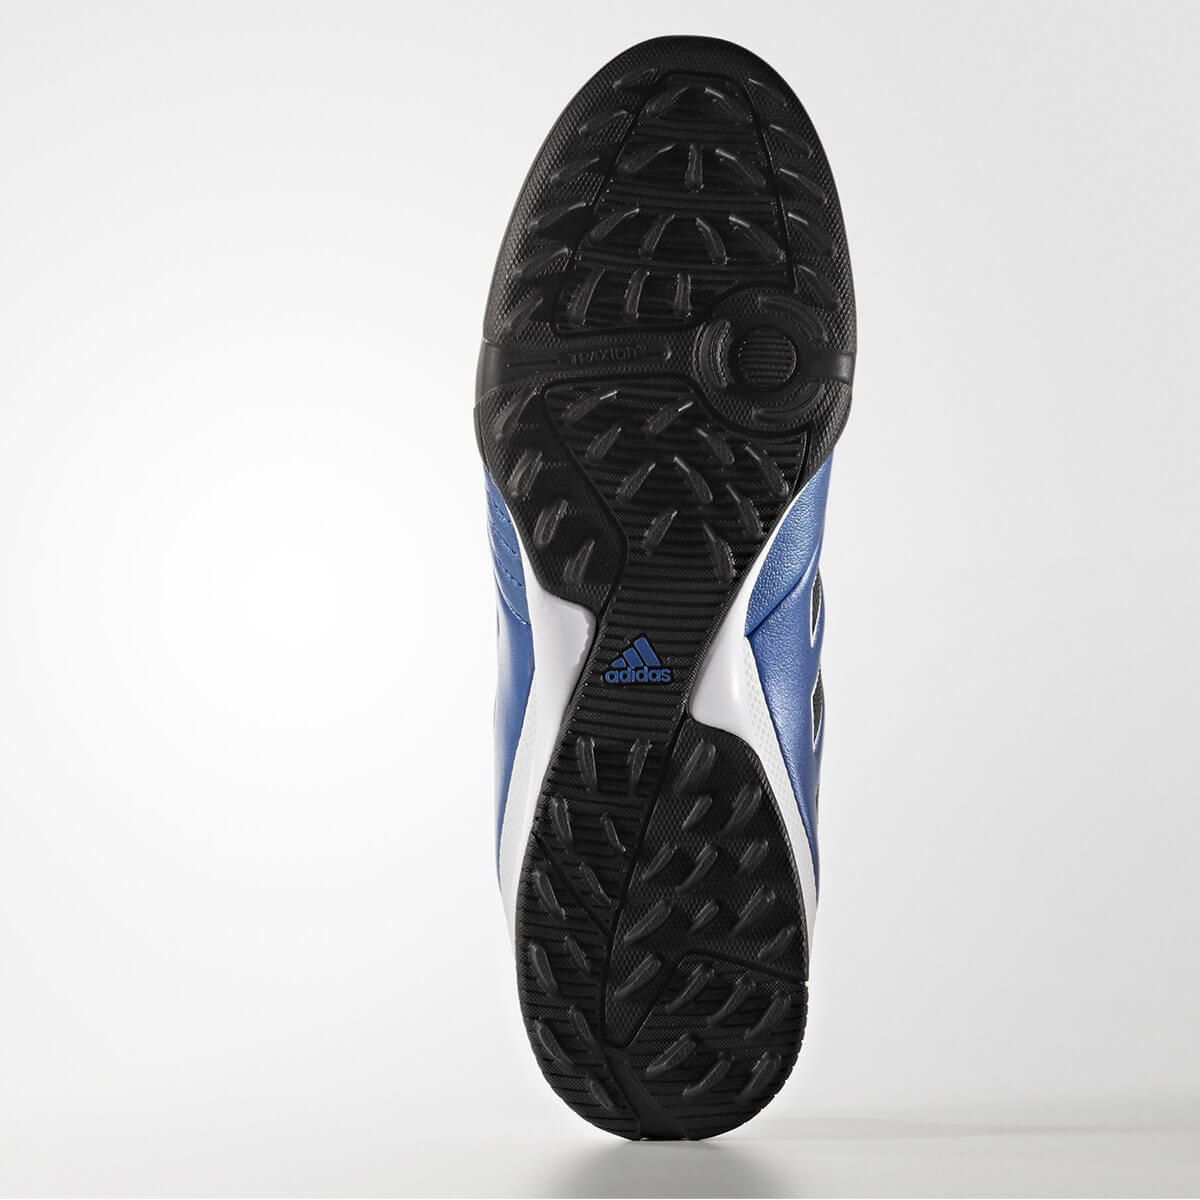 8ca80a7886 Chuteira Society Adidas Copa 17 Tf - BRACIA SHOP  Loja de Roupas ...